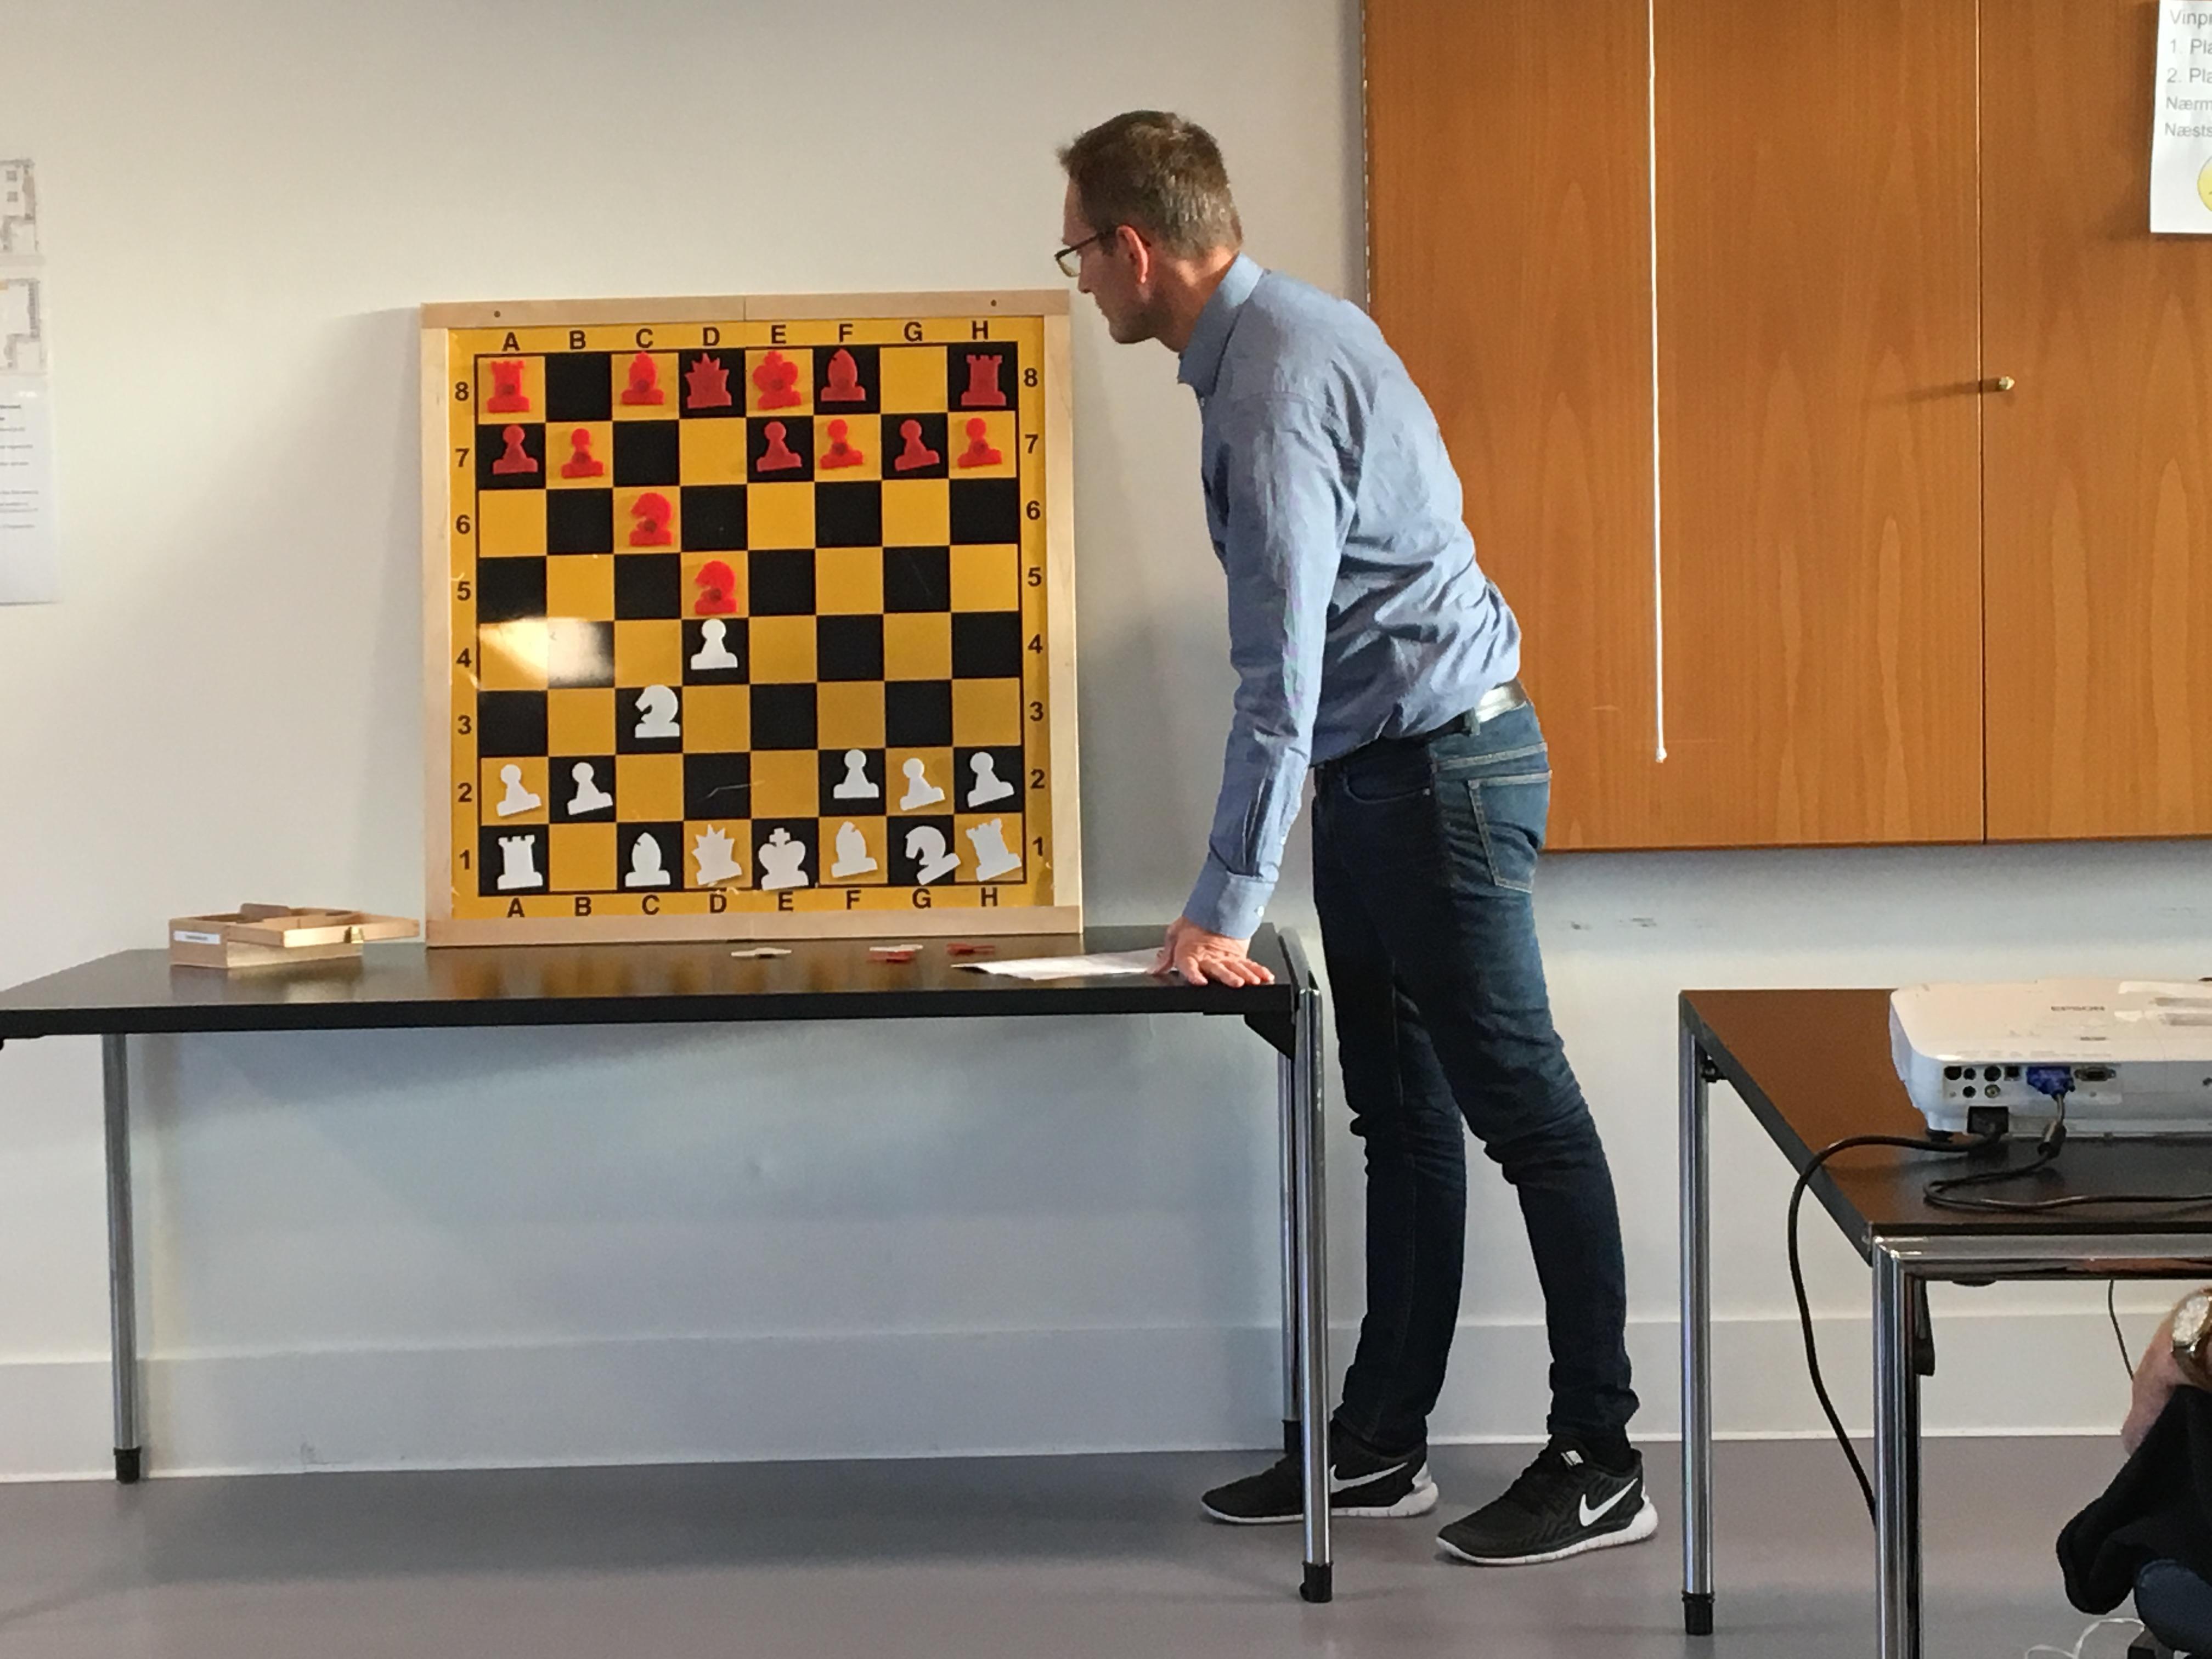 opstilling i skak